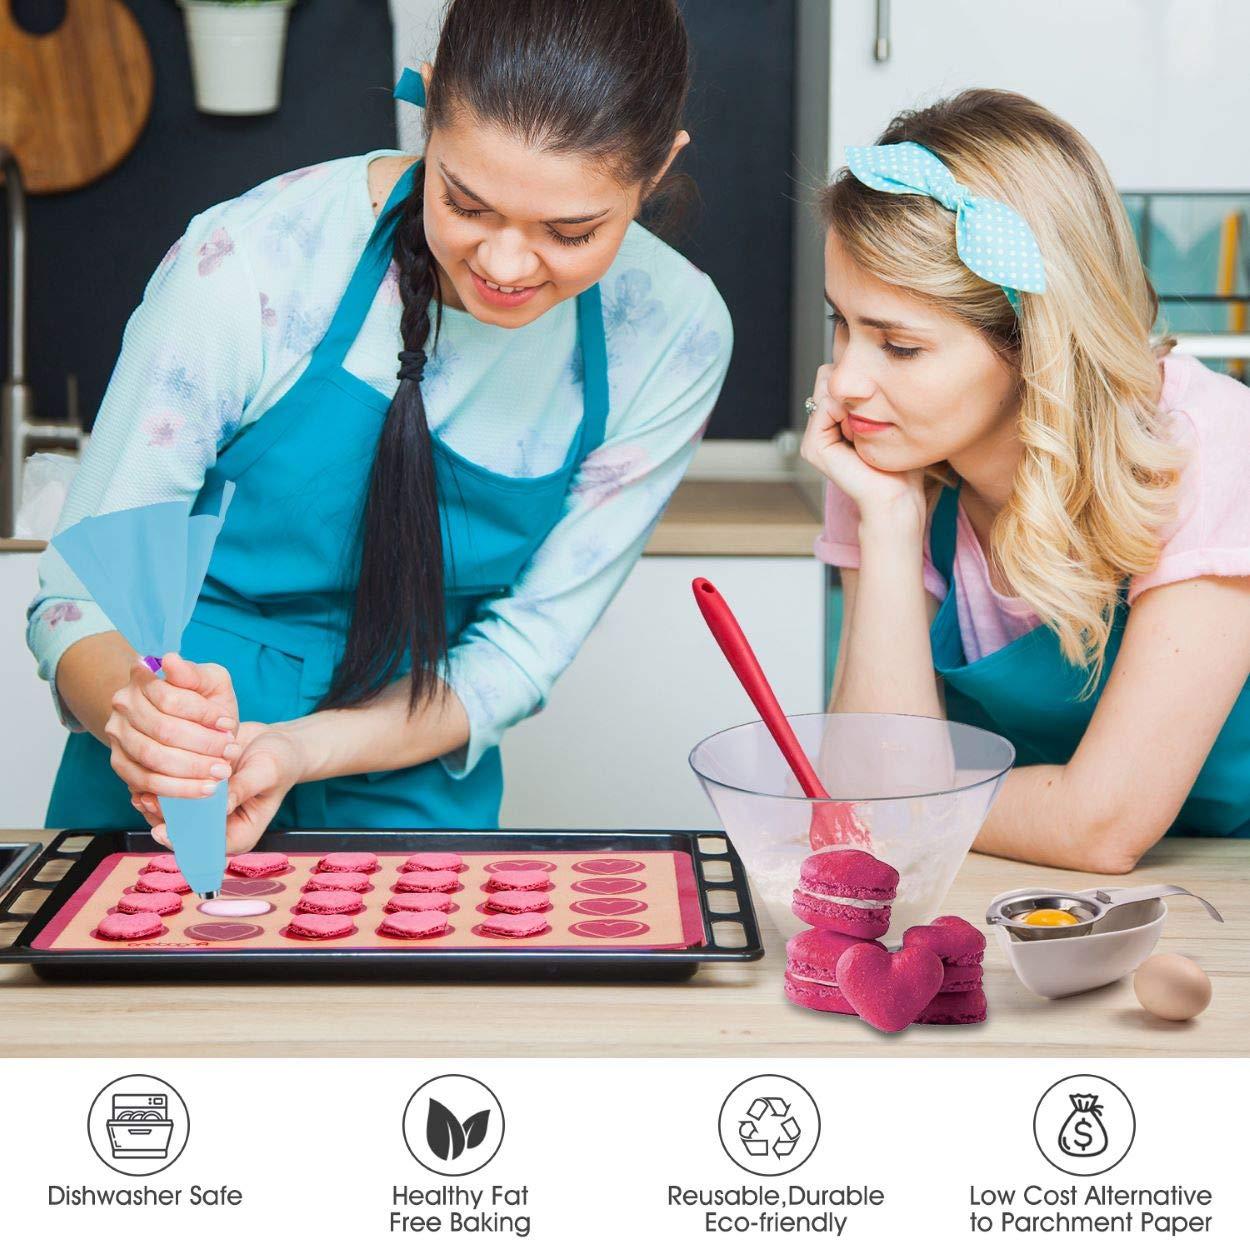 Silicone Baking Mat Macaron Mat Kit(14pcs set) Macaroon Baking Mat Set of 2 Half Sheet Macaron Silicone Mat Nonstick Macaron Mat Sheet,6 Piping Tip,2 Piping Bag with 2 Bag Tie,1 coupler (11.6''x16.5'') by Angadona (Image #6)